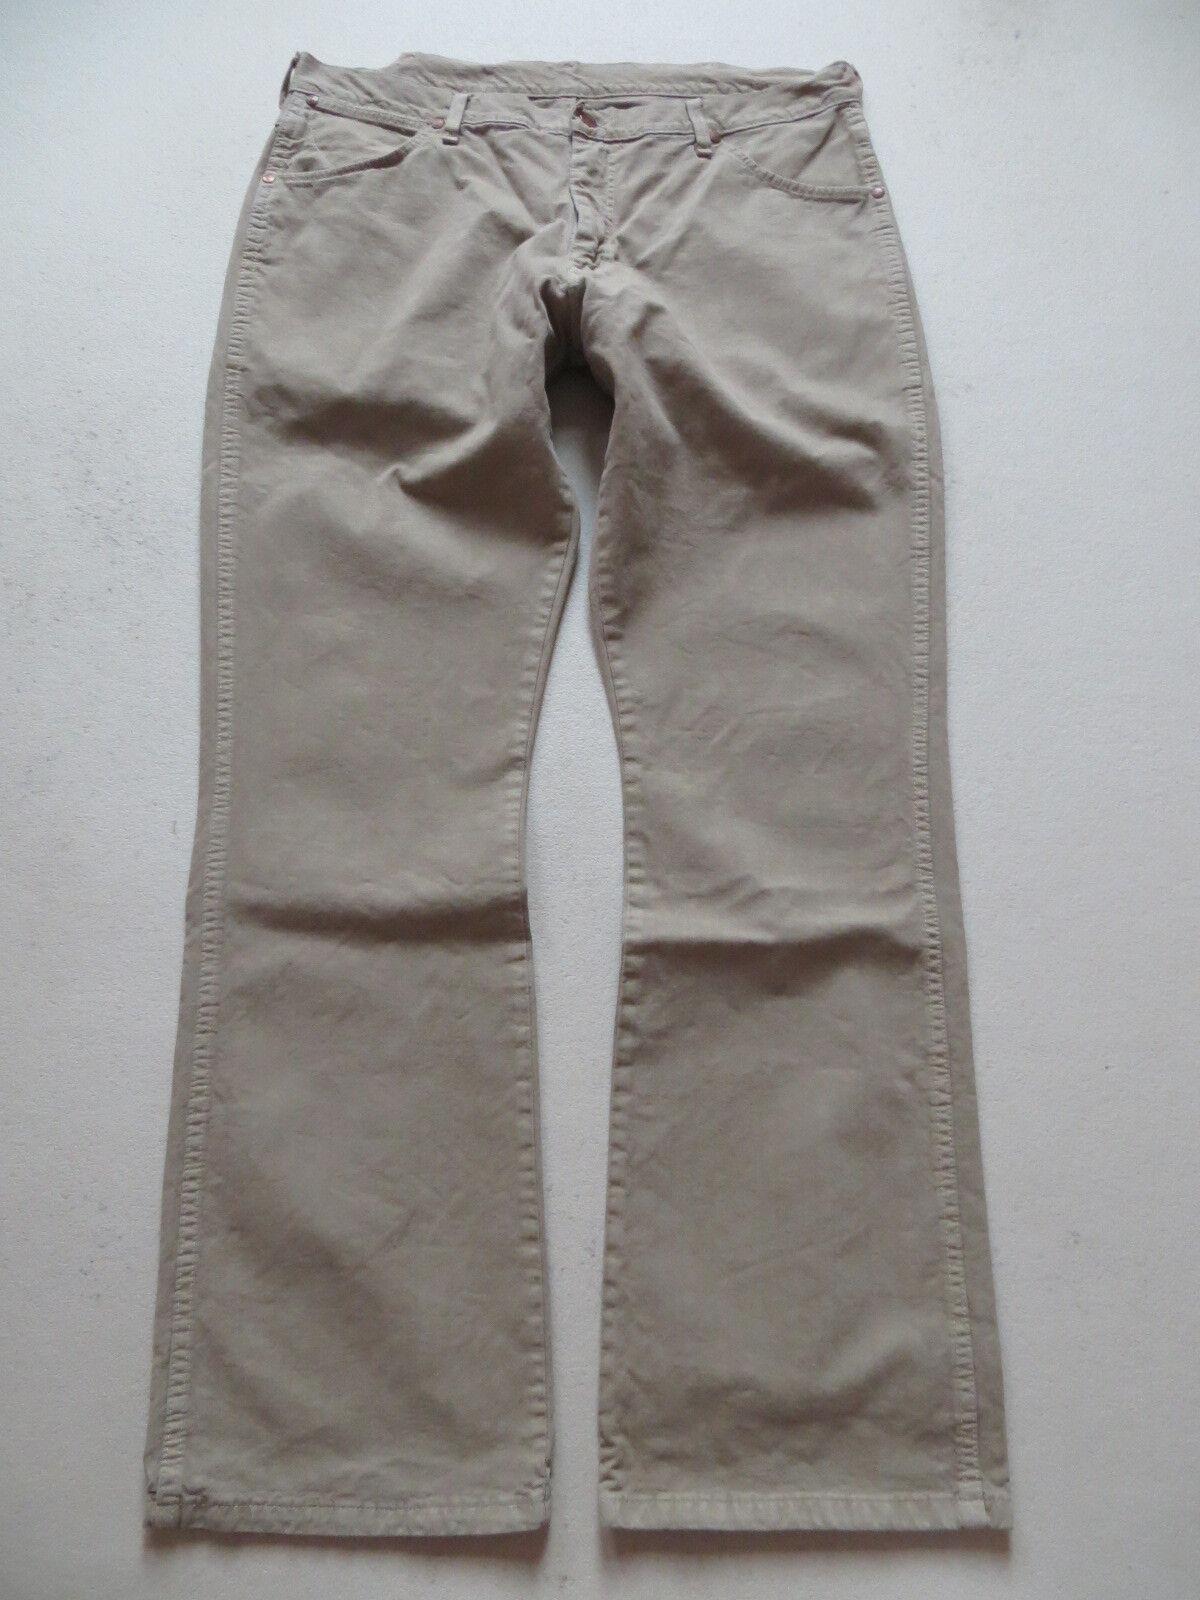 Wrangler DAYTON Stiefelcut Jeans Hose Hose Hose W 38  L 34, khaki   seltene Farbe, Sehr gut 84d376